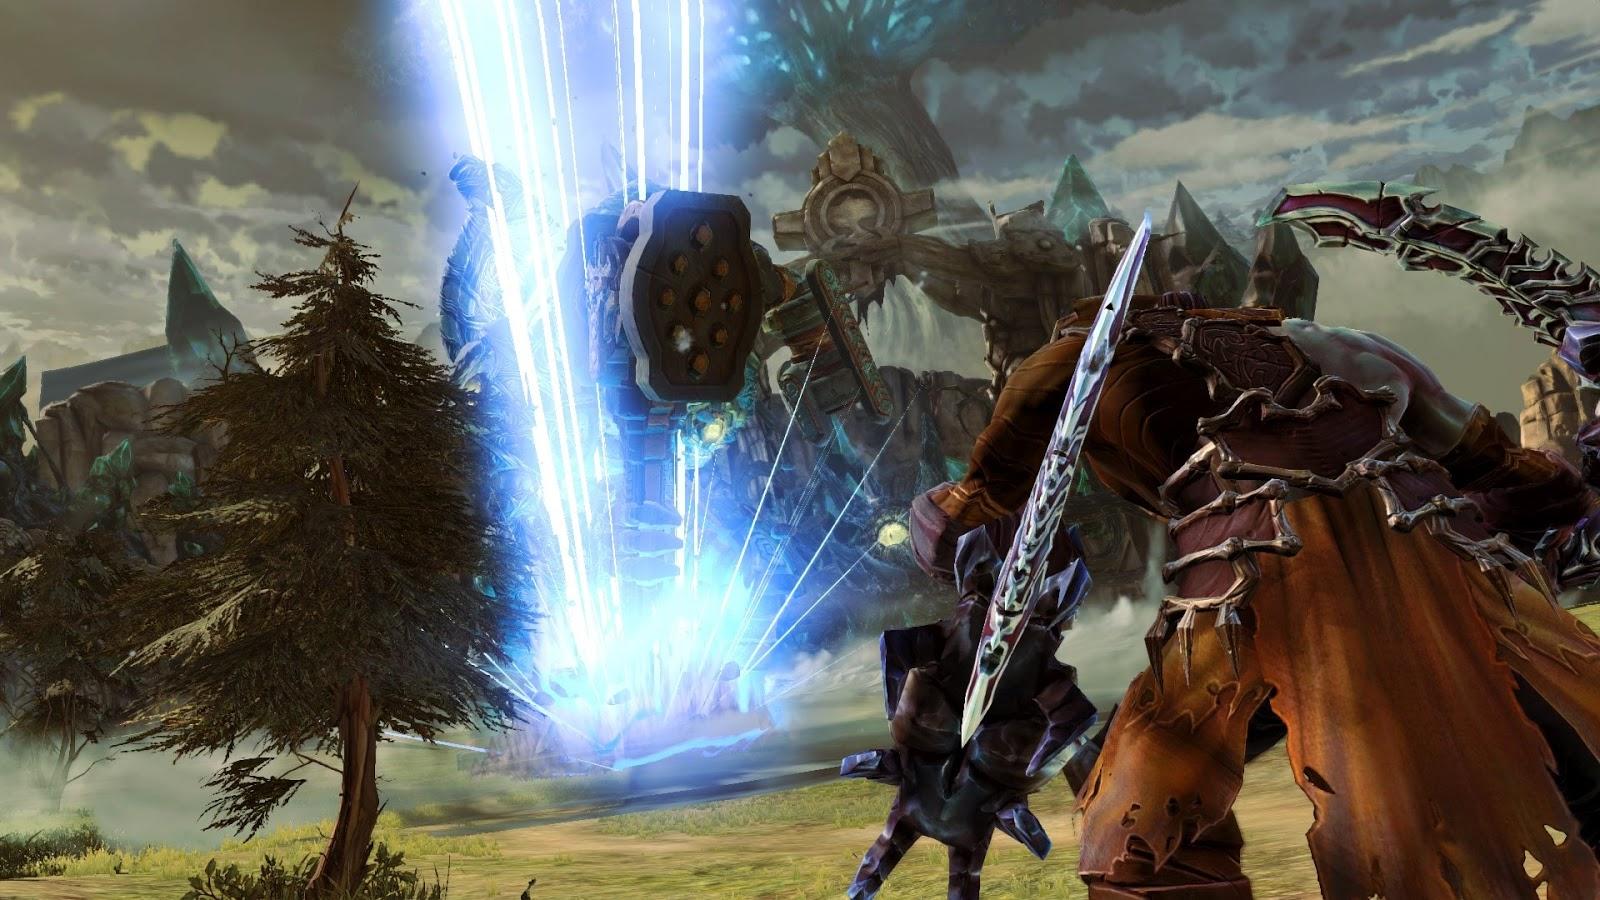 Darksiders 2 deathinitive edition pc full espa ol gamezfull - Descargar darksiders 2 ...